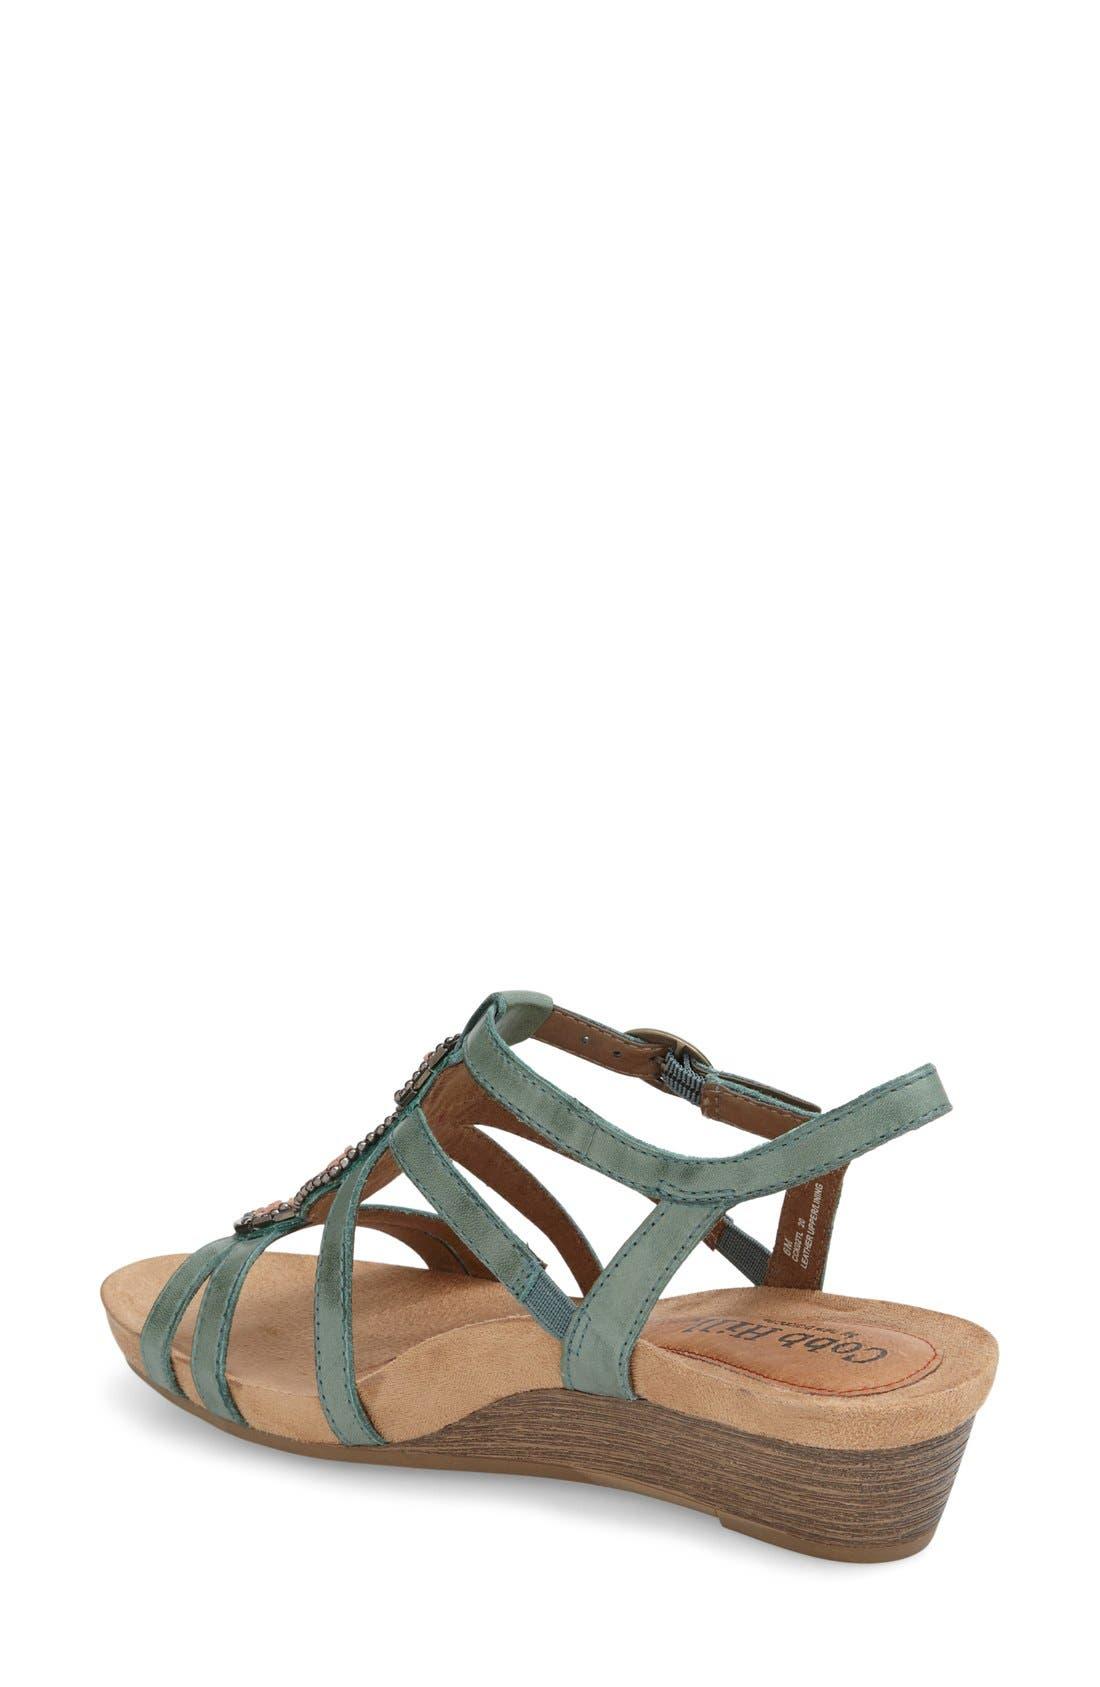 'Hannah' Leather Sandal,                             Alternate thumbnail 2, color,                             Teal Leather